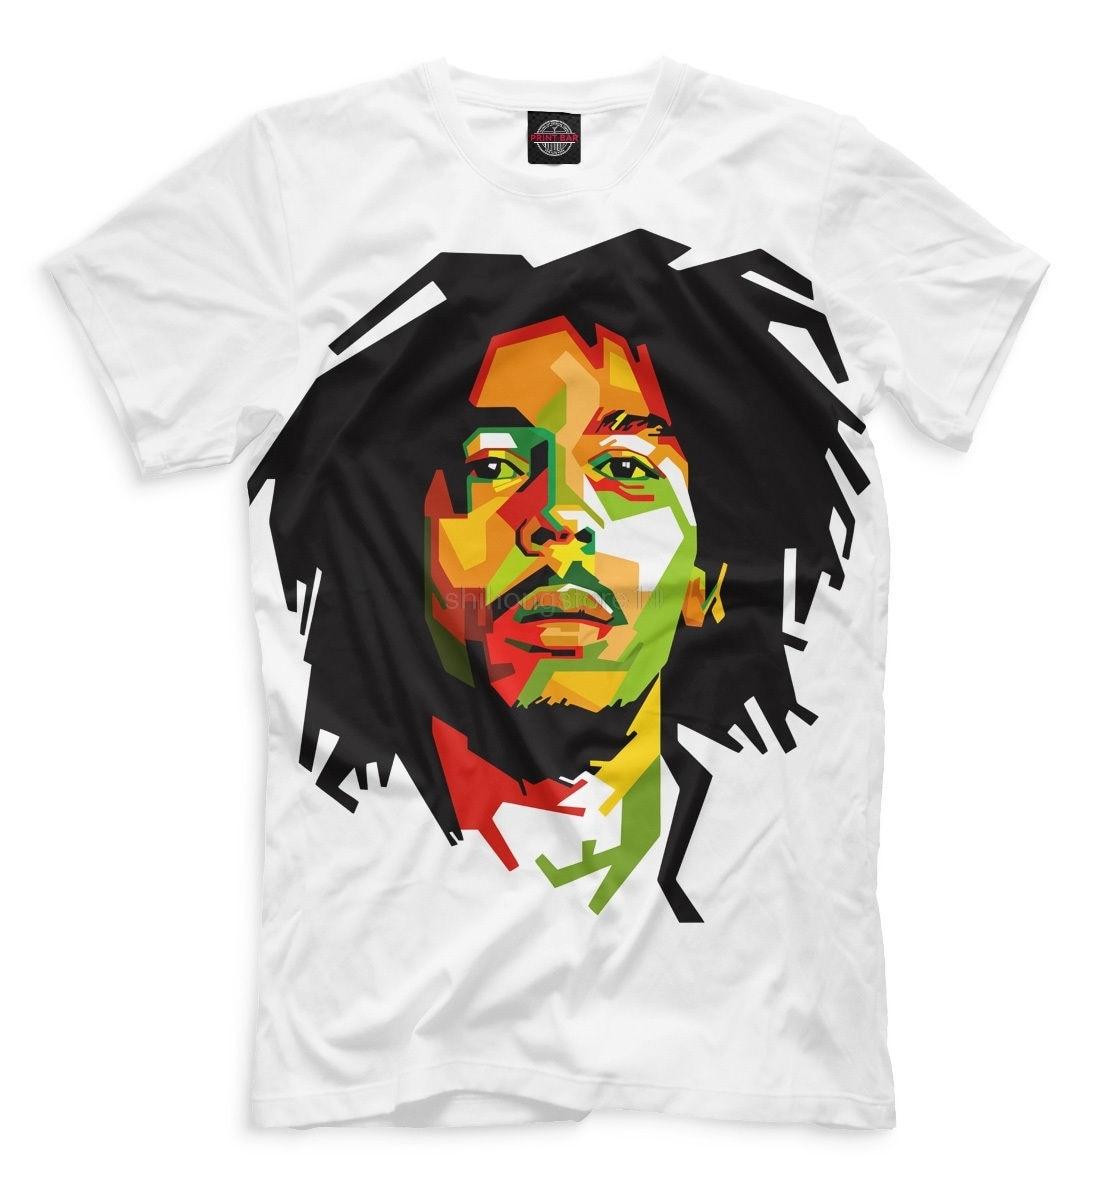 Rational 2019 New Summer Fashion Tee Shirt Bob Marley New T-shirt Rasta Flag Reggae Jamaica Cool Designe Hq Print